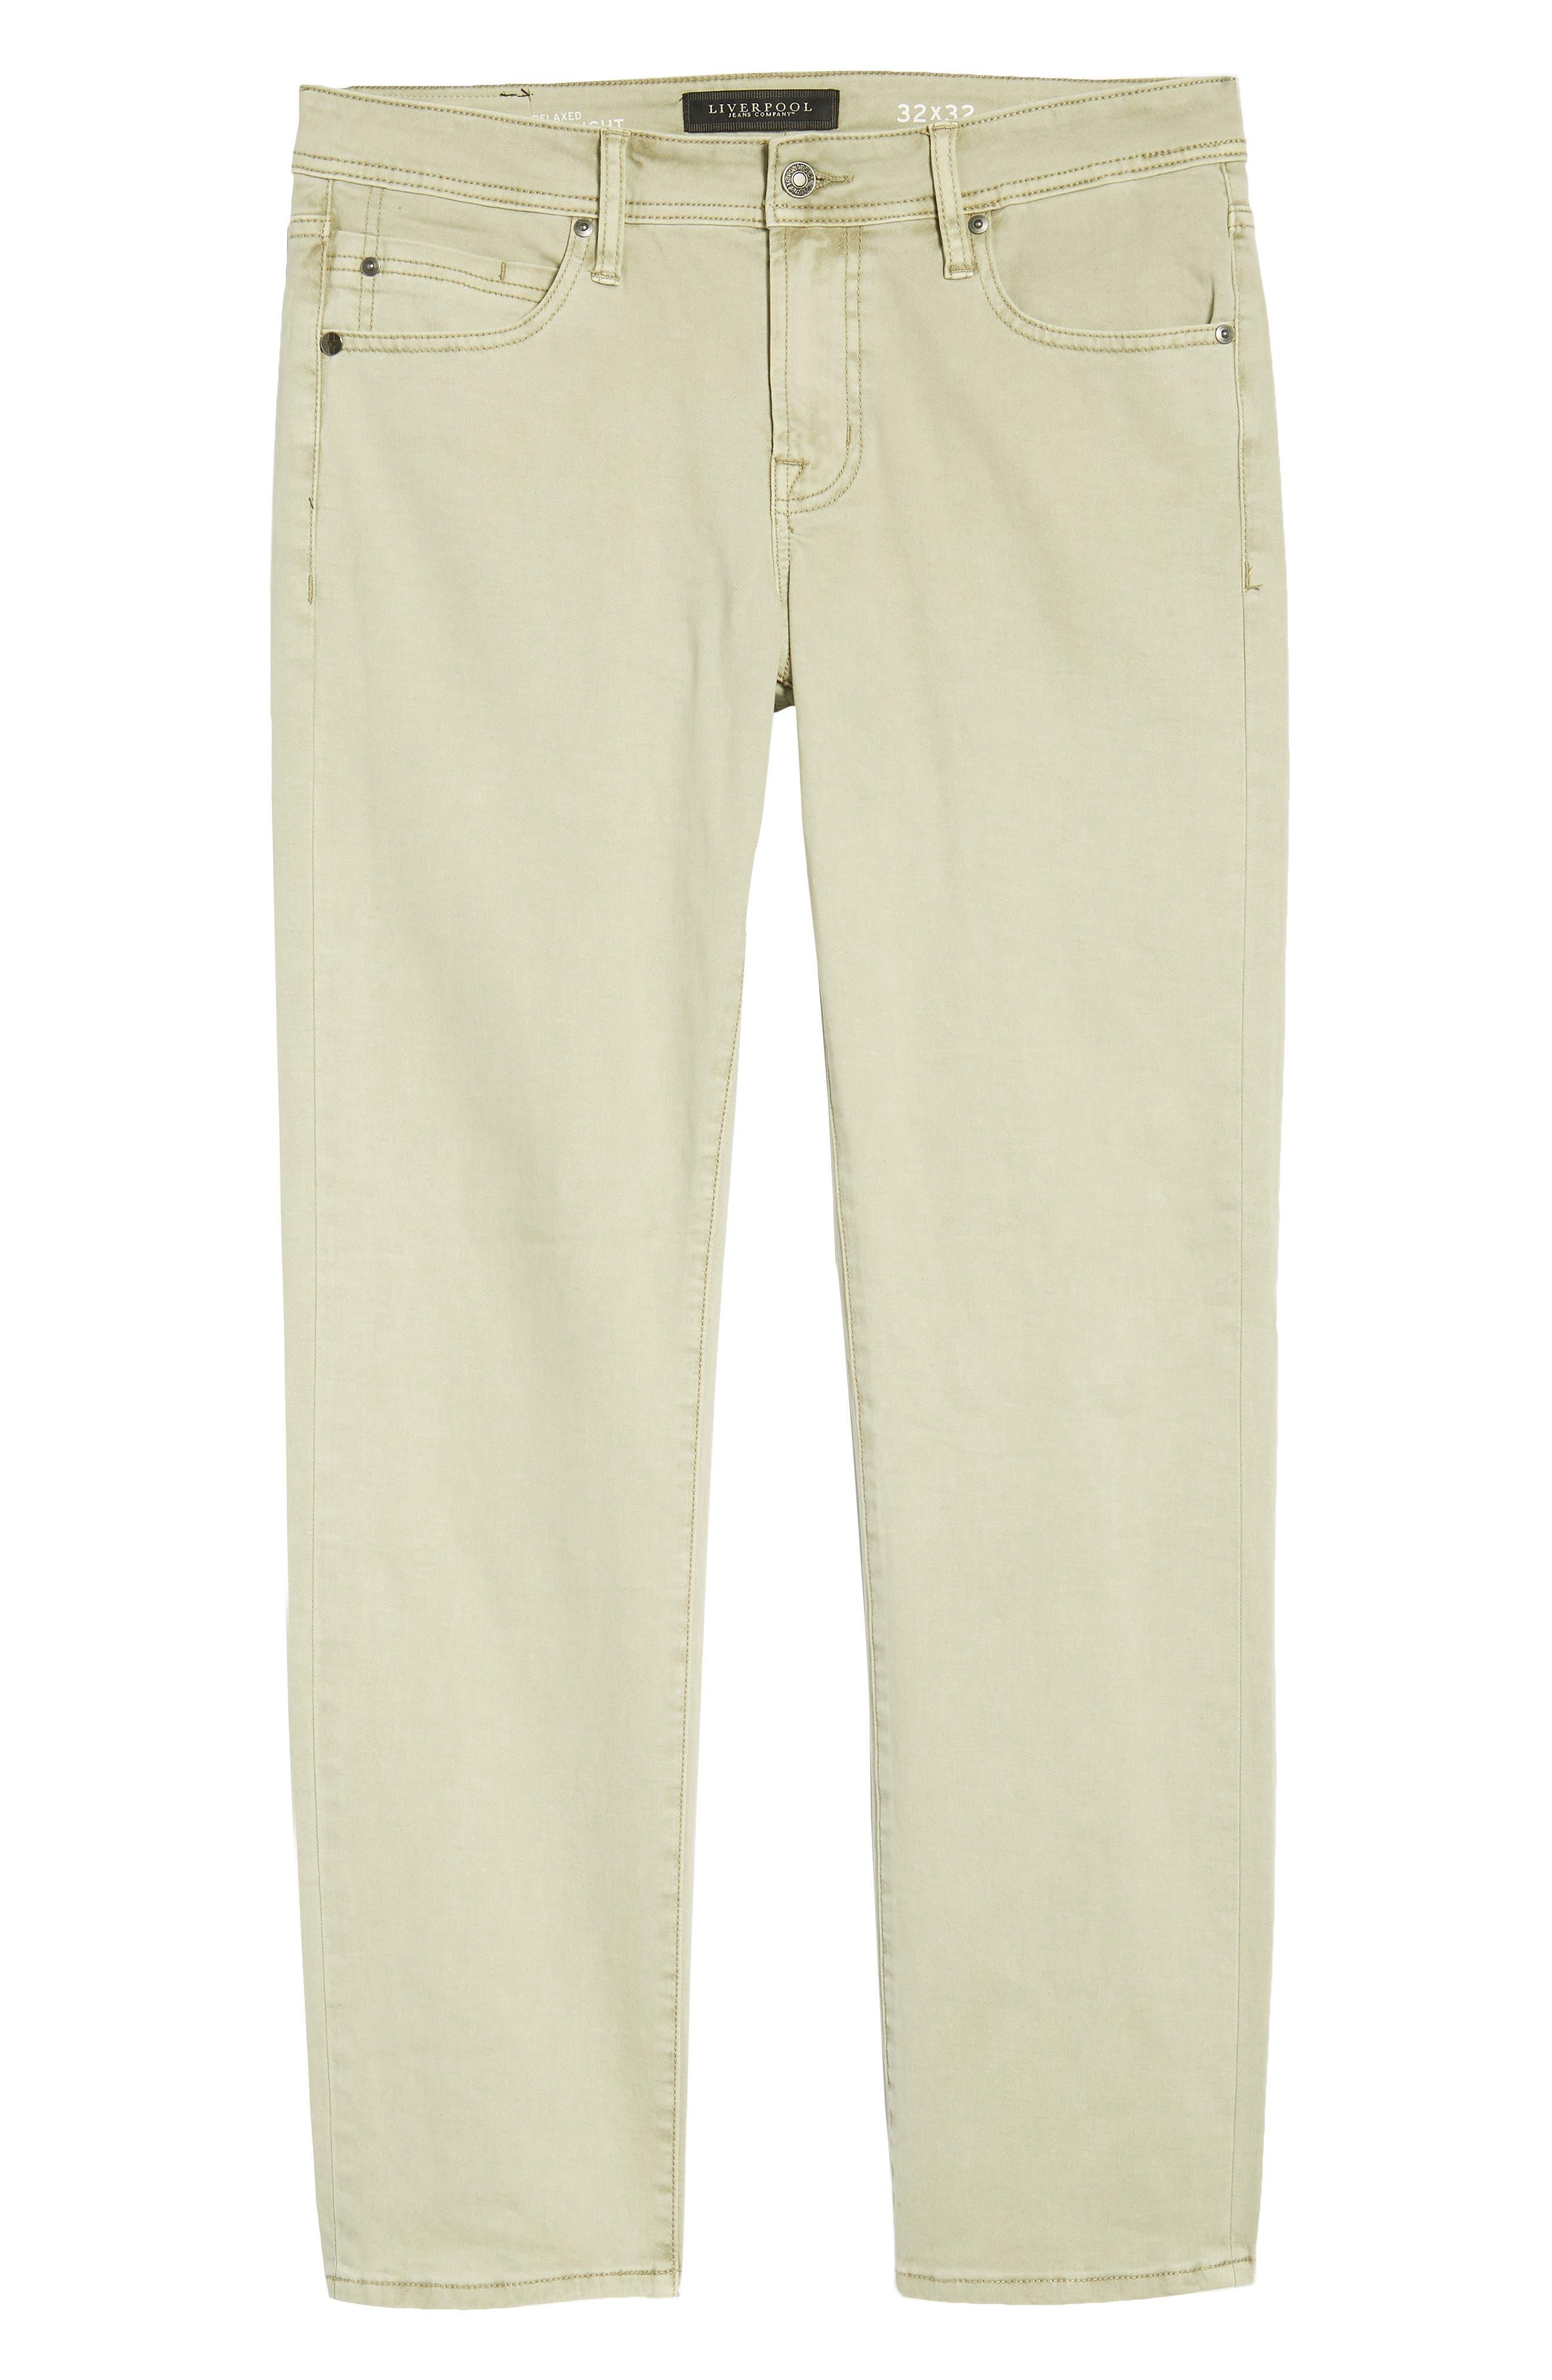 Jeans Co. Straight Leg Jeans,                             Alternate thumbnail 6, color,                             SANDSTROM